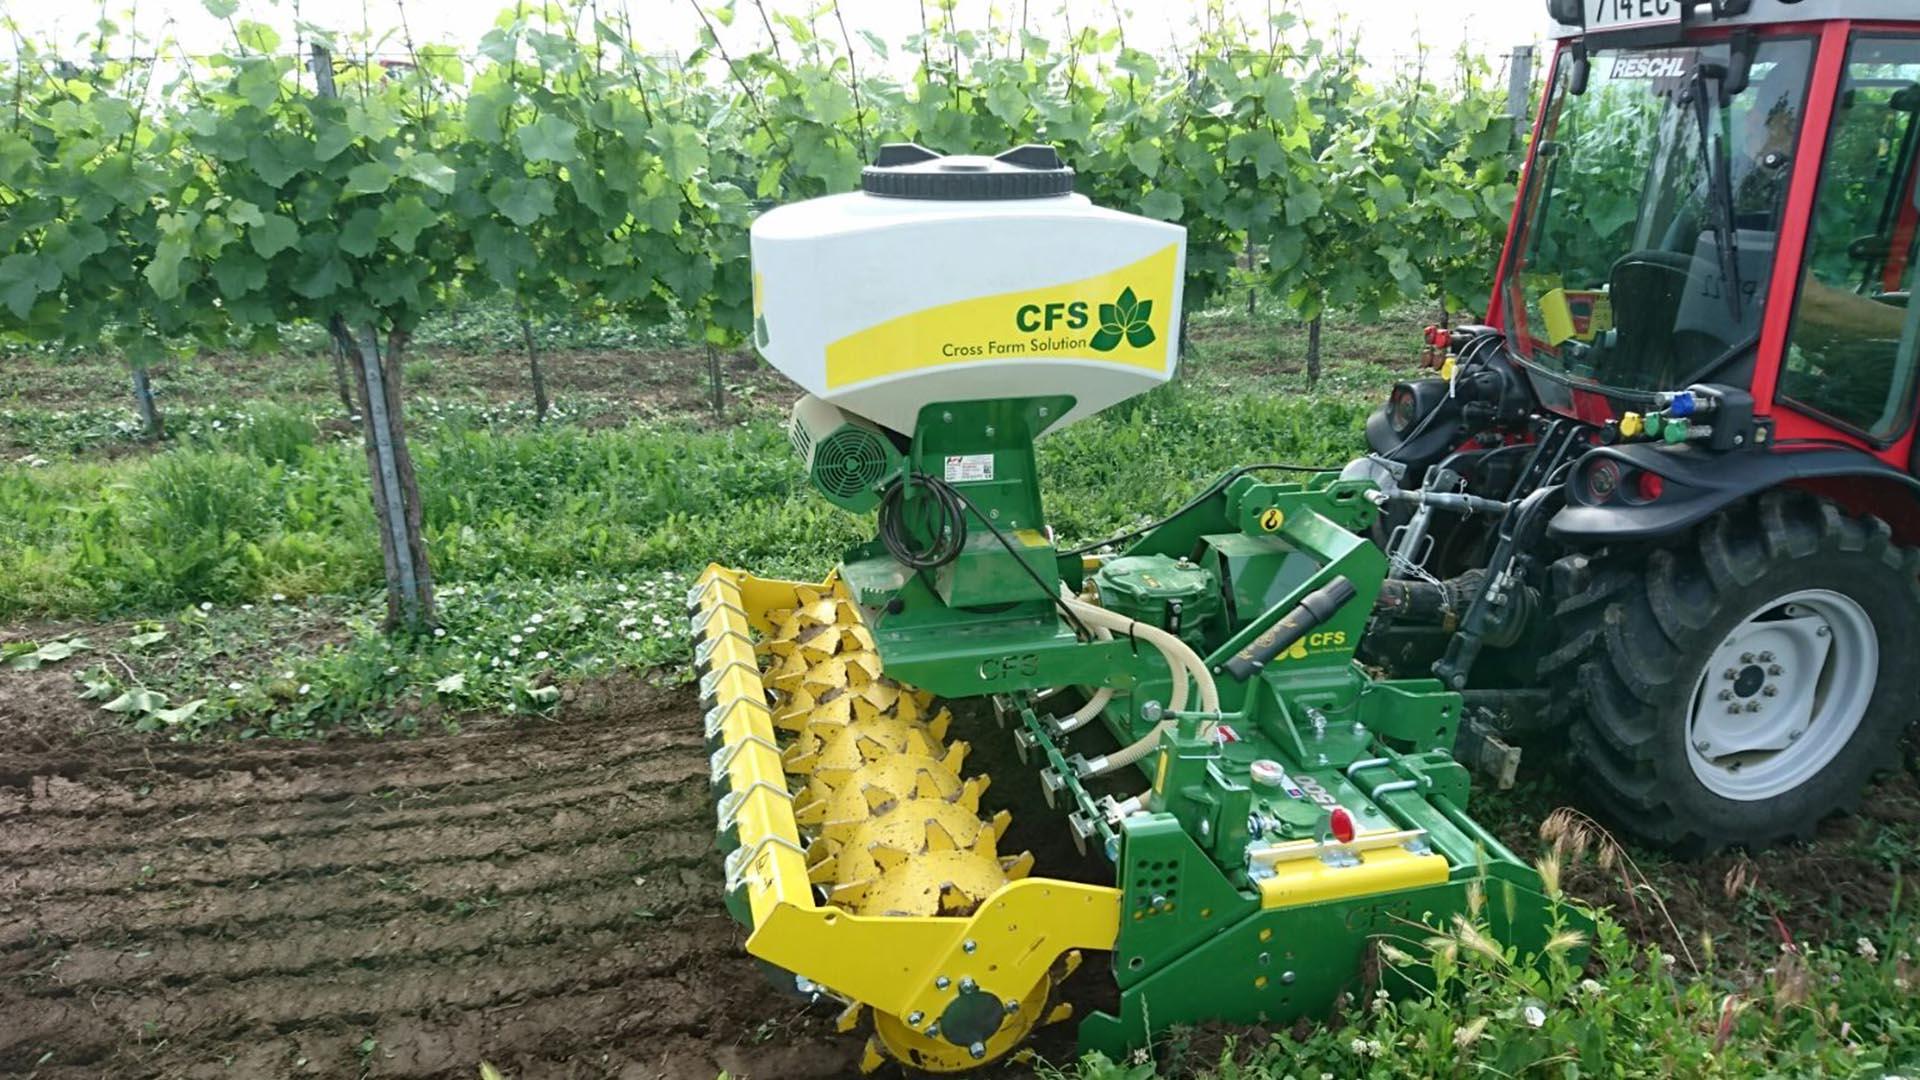 Produktbild_Kreiselegge Keiler Weinbau_CFS Cross Farm Solution